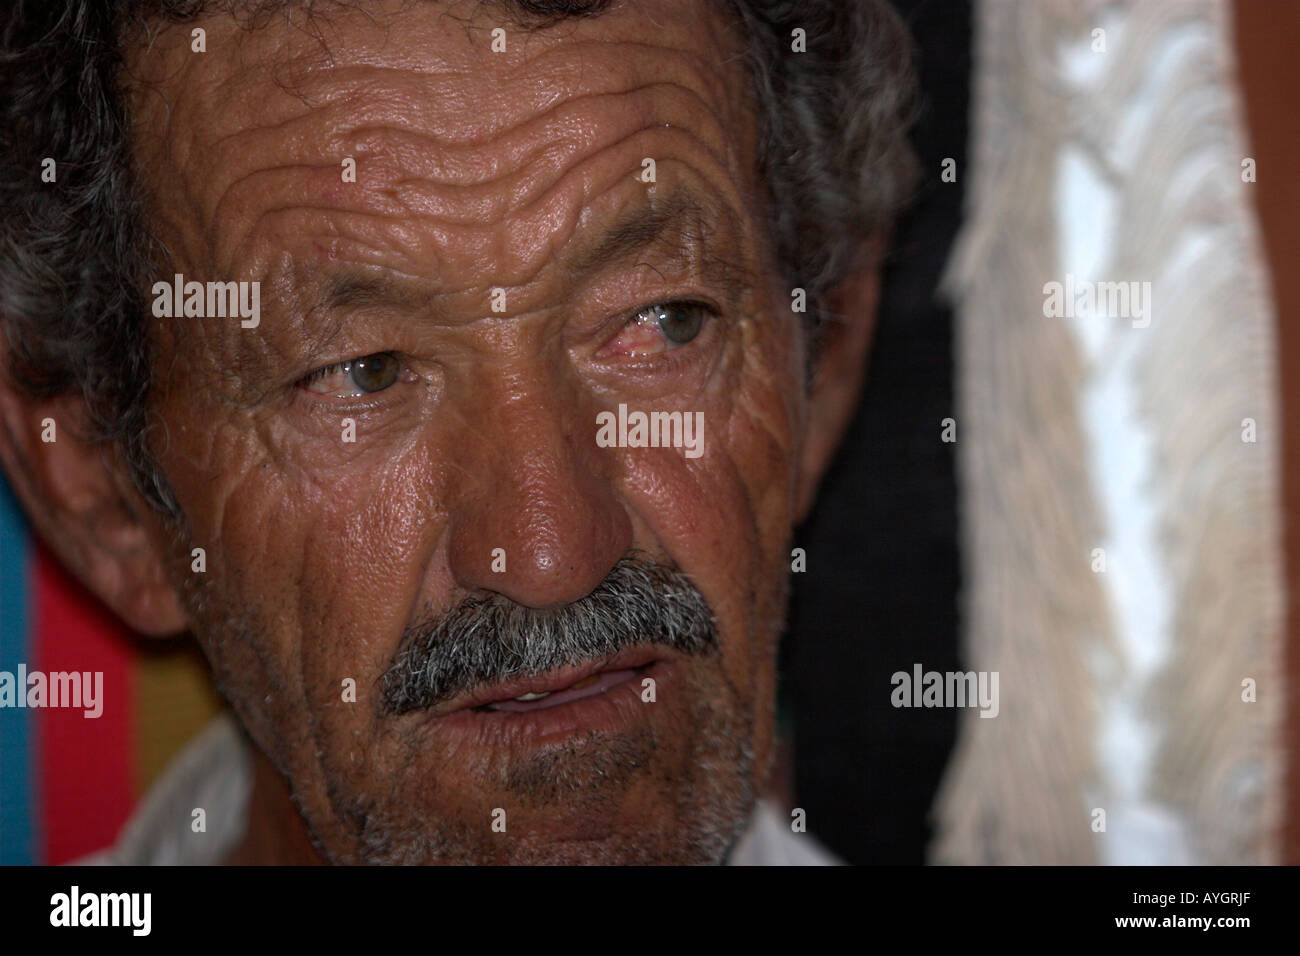 Unshaved Berber man with moustache underground troglodyte family home Matmata Tunisia - Stock Image